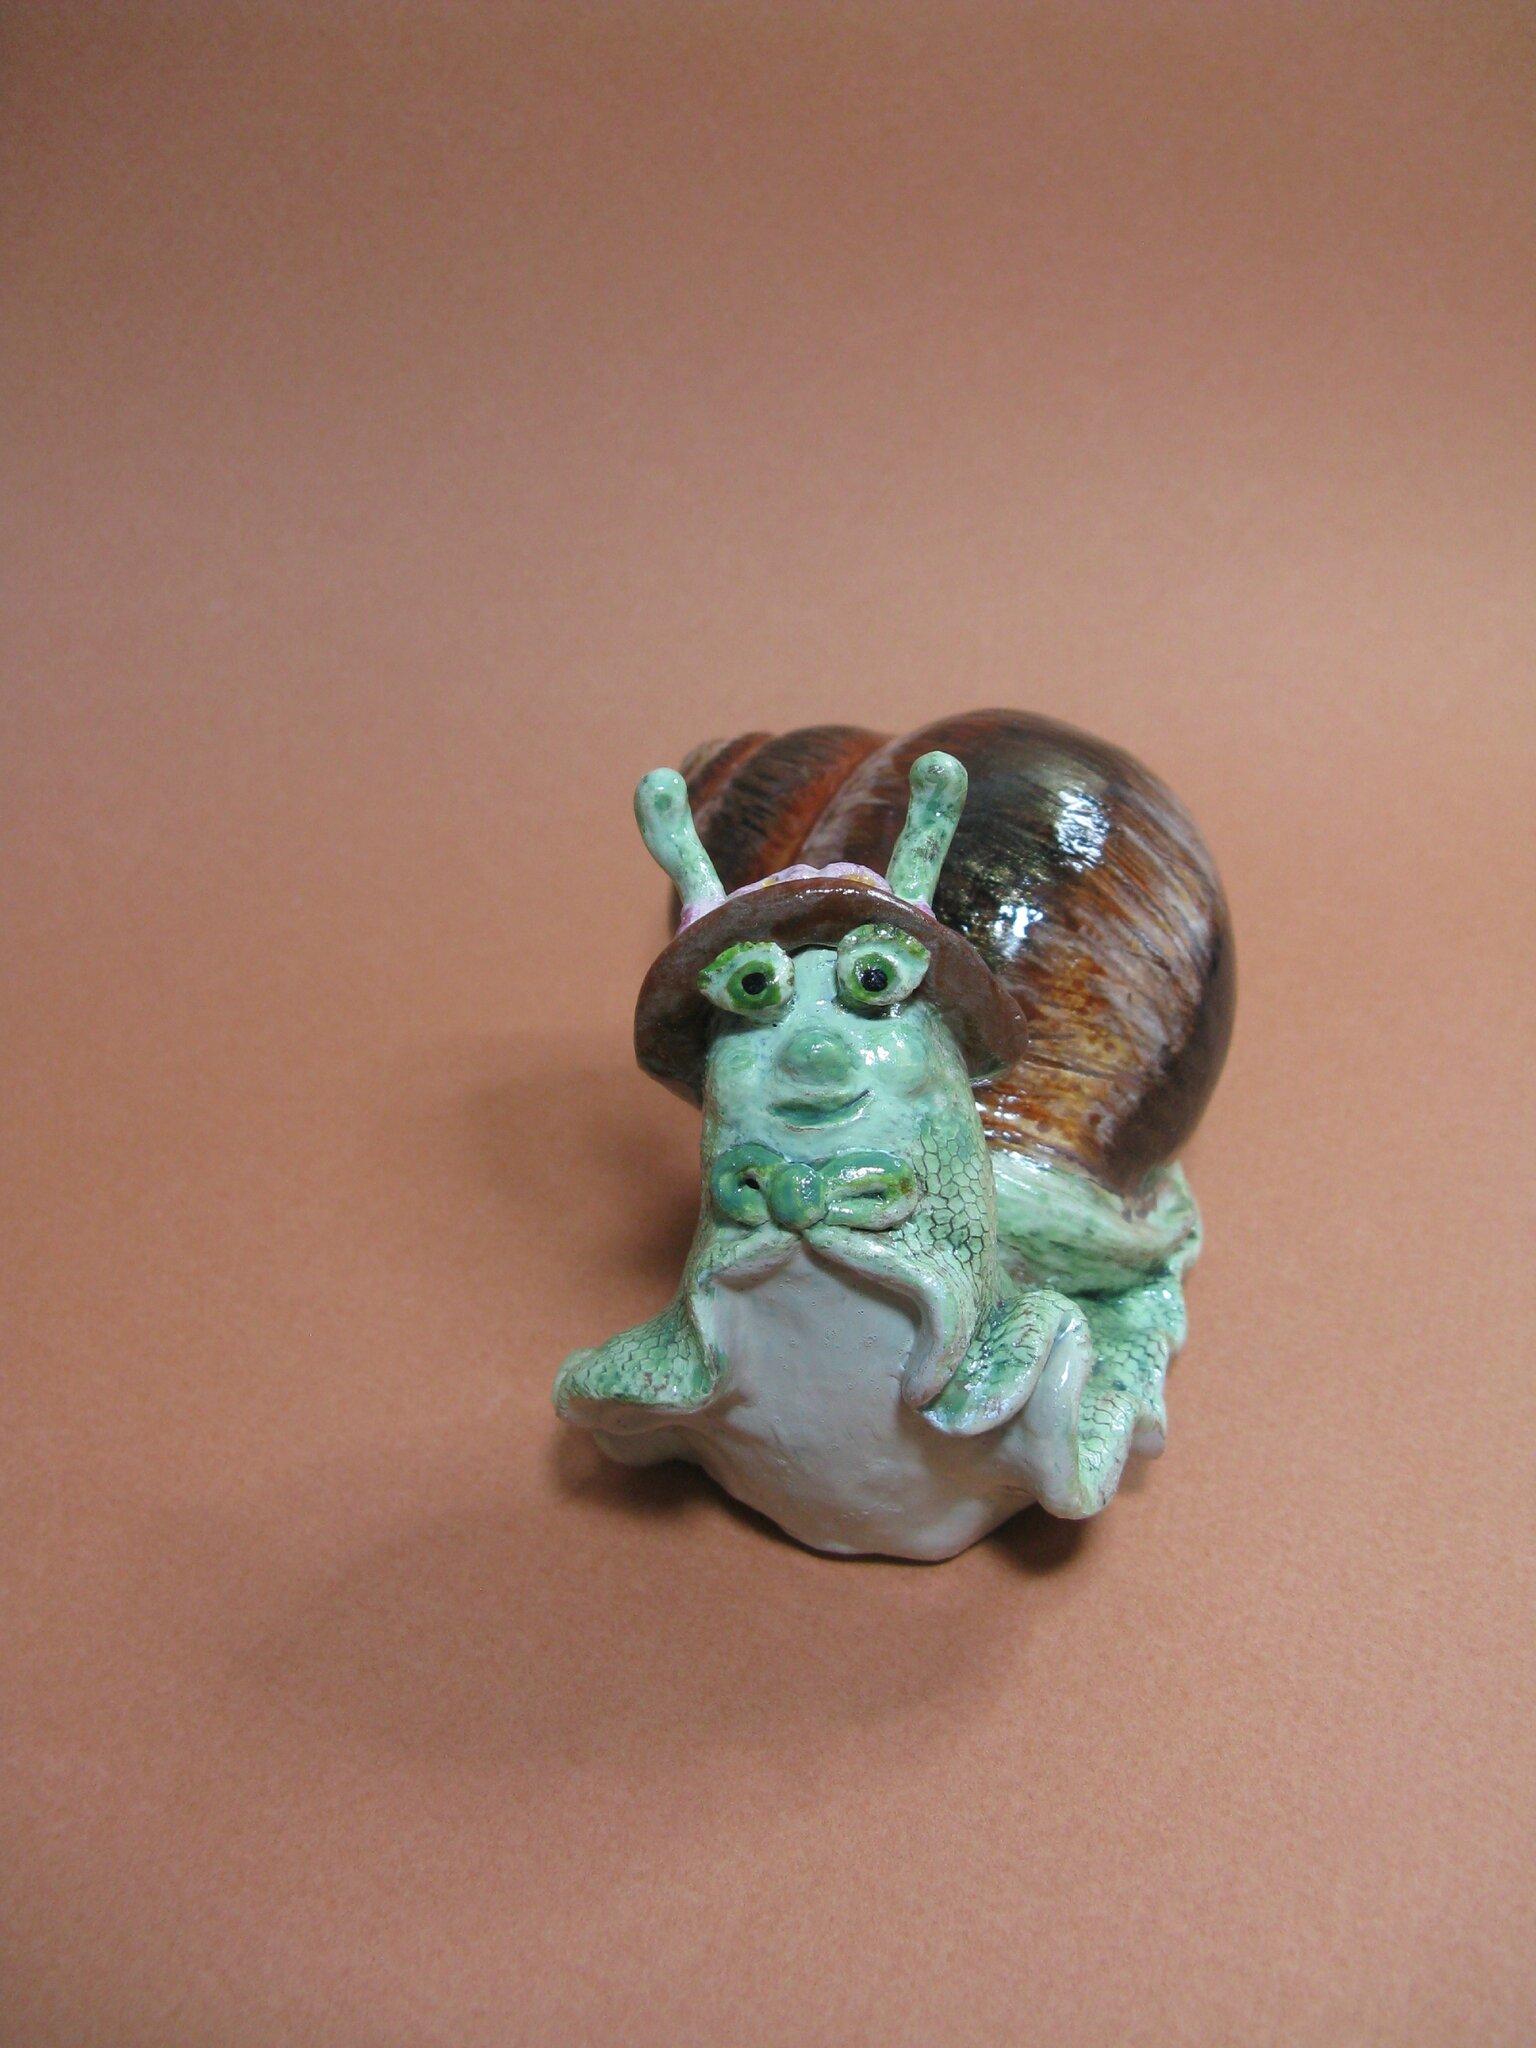 Gastounette, la petite escargotte